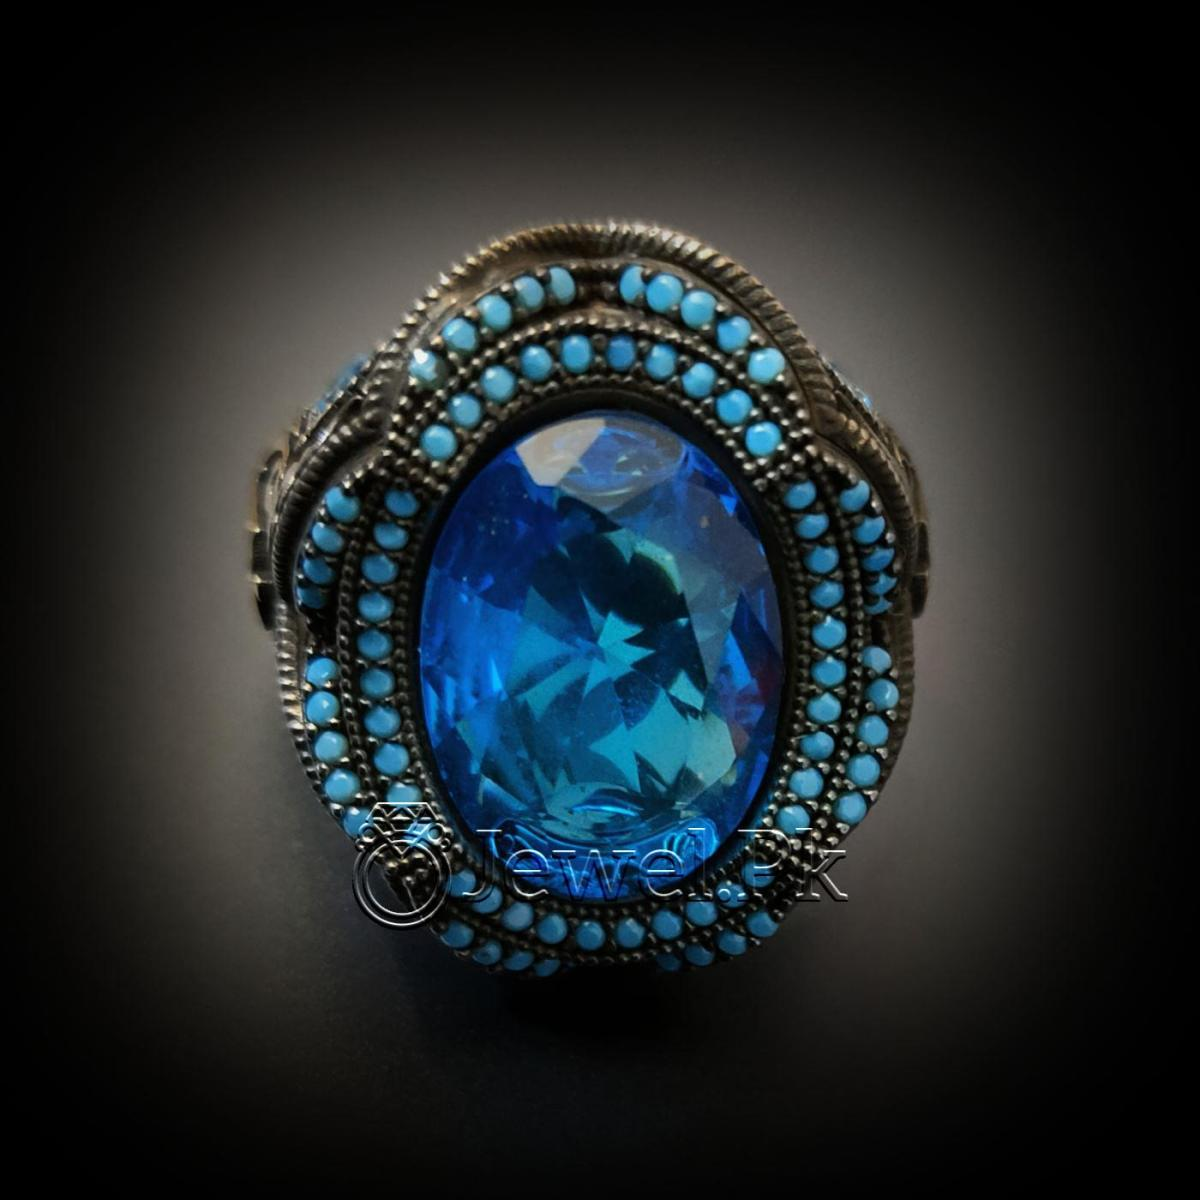 Turkish Ring 925 Silver Chandi Turkey Rings 3 natural gemstones pakistan + 925 silver jewelry online